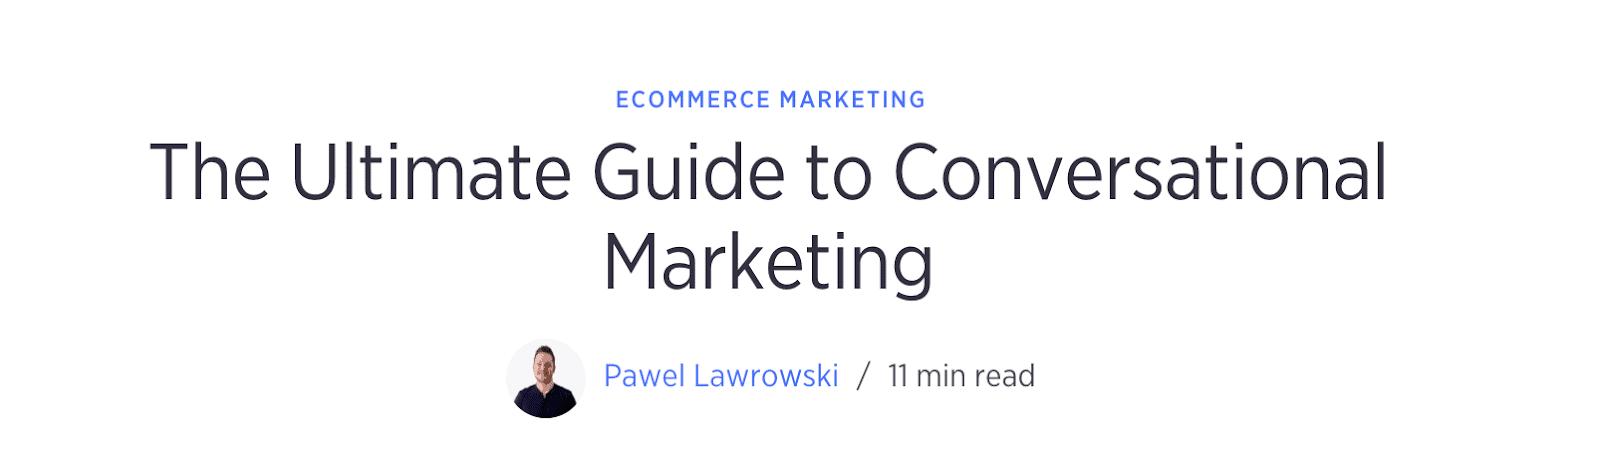 Expert guide to conversational marketing